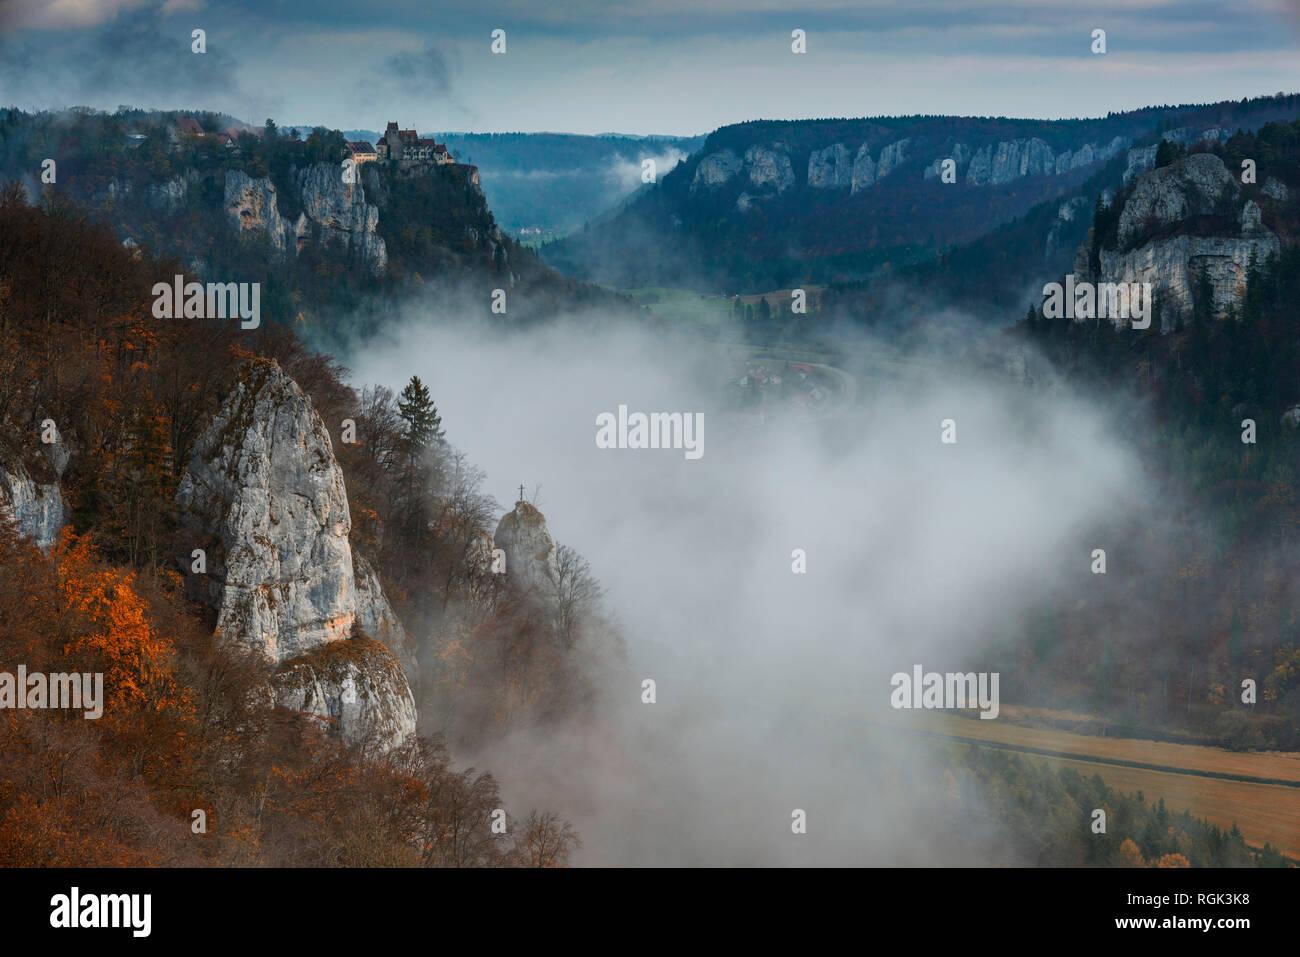 Schloss Werenwag, Naturpark Obere Donau, Schwaebische Alb, Baden-Wuerttemberg, Deutschland, Europa - Stock Image